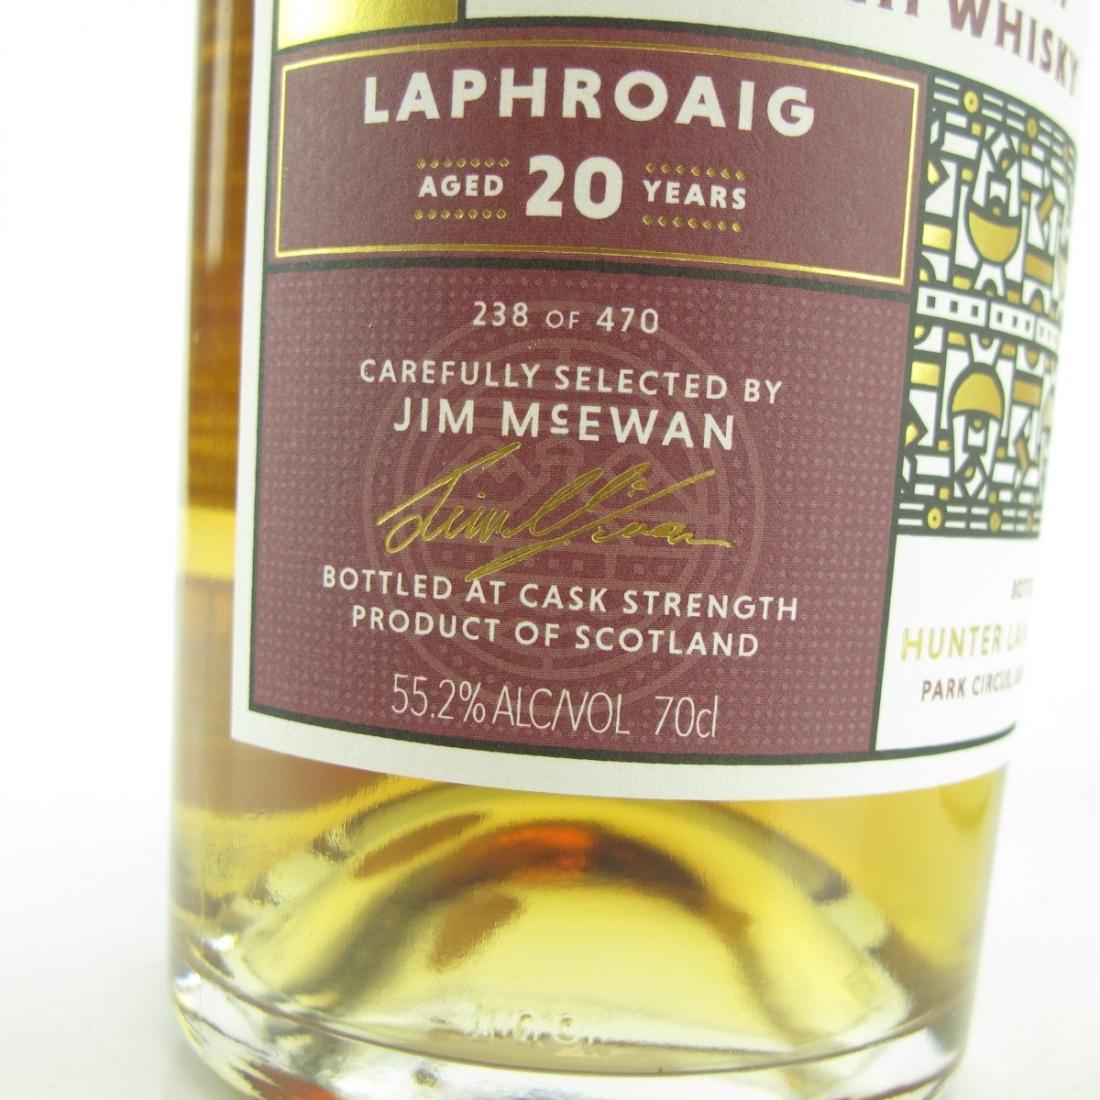 Laphroaig 20 Year Old Douglas Laing Kinship / Feis Ile 2018